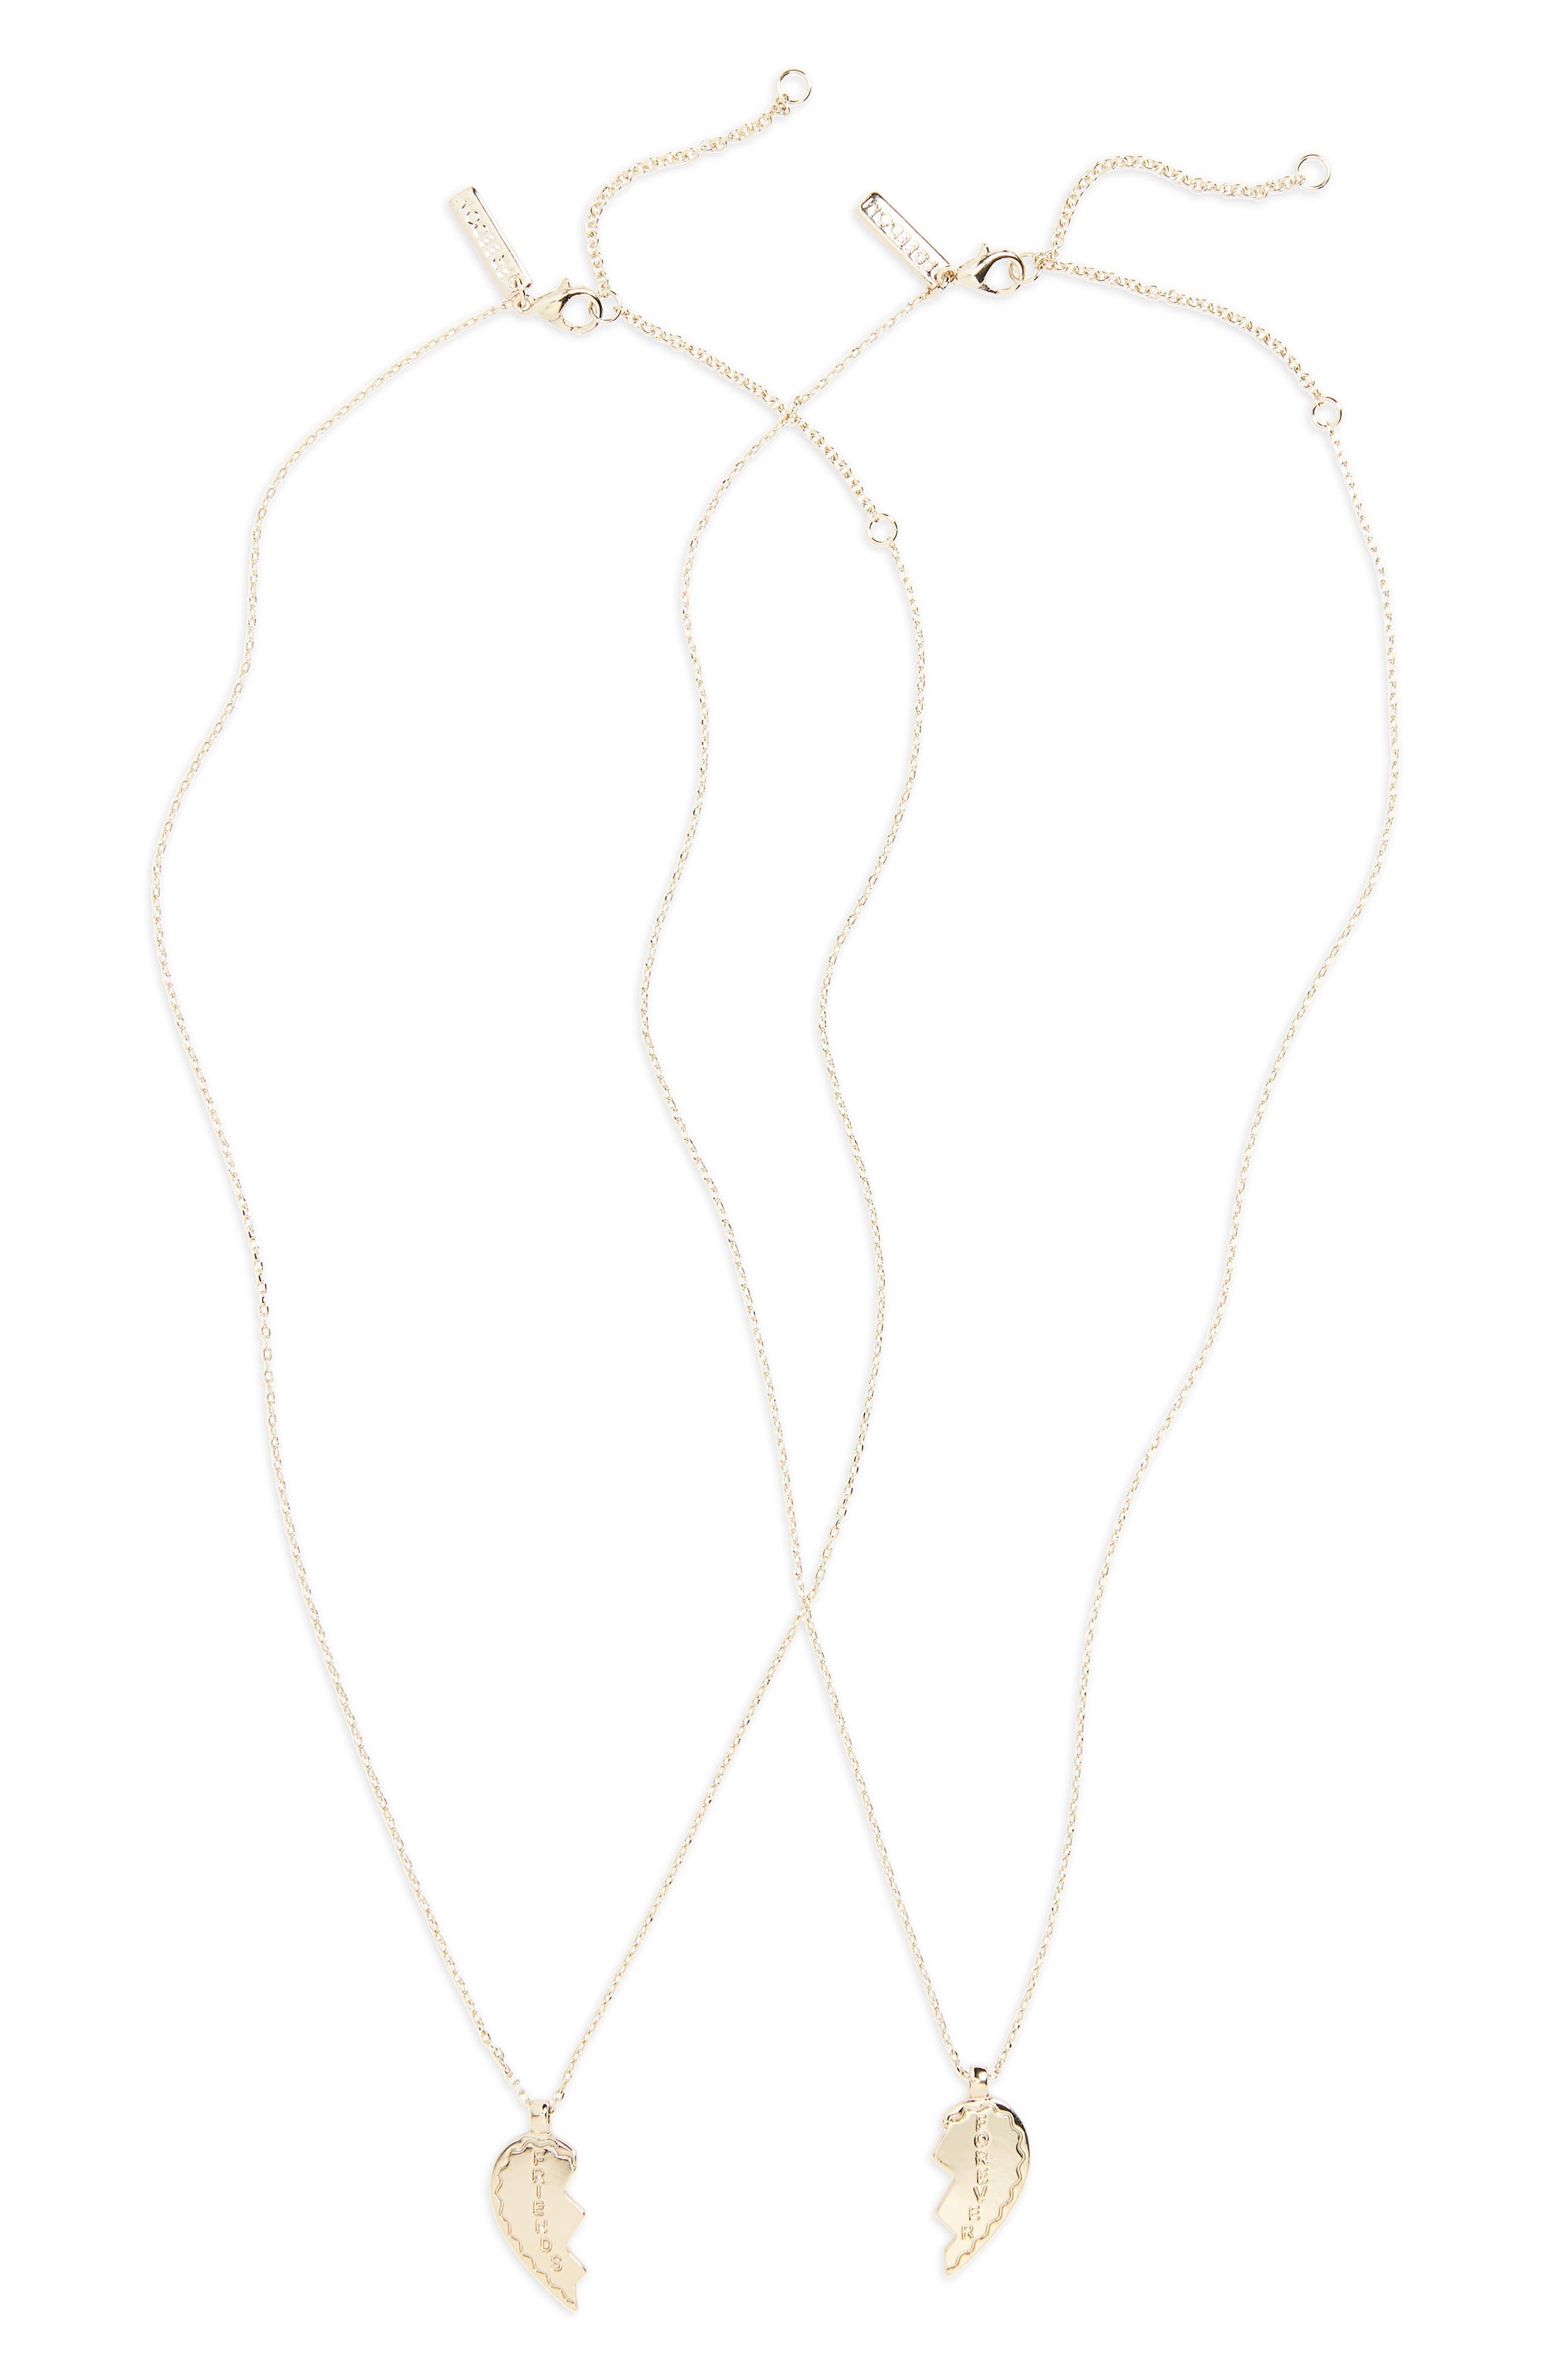 Gal Broken Heart Pendant Necklace,                             Main thumbnail 1, color,